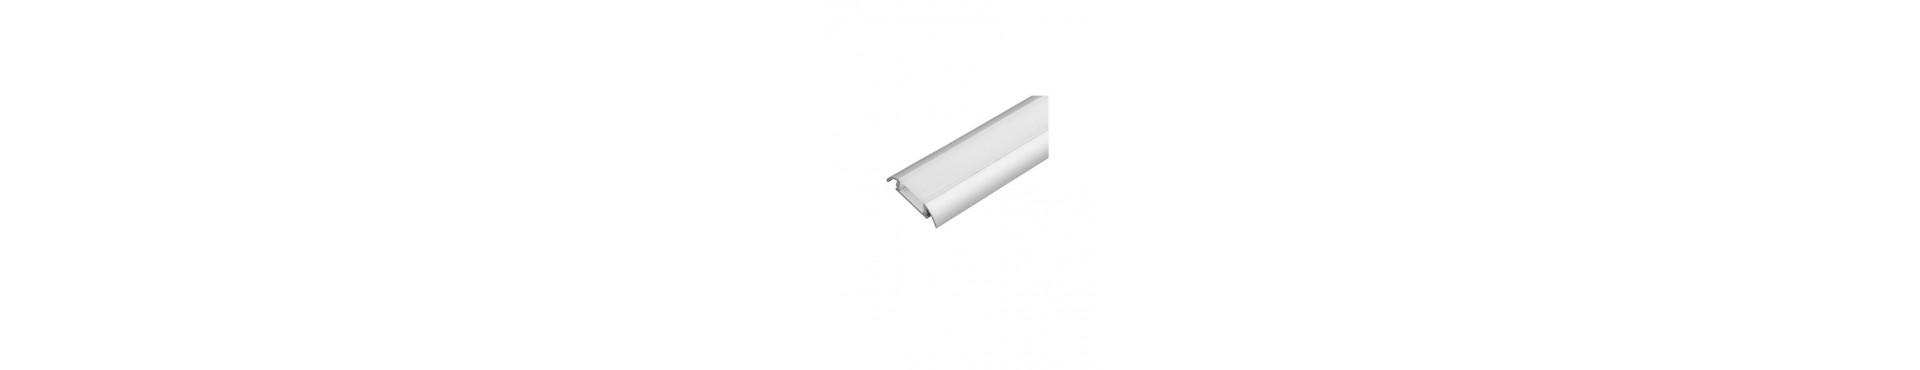 Aluminiumsprofiler til LED bånd